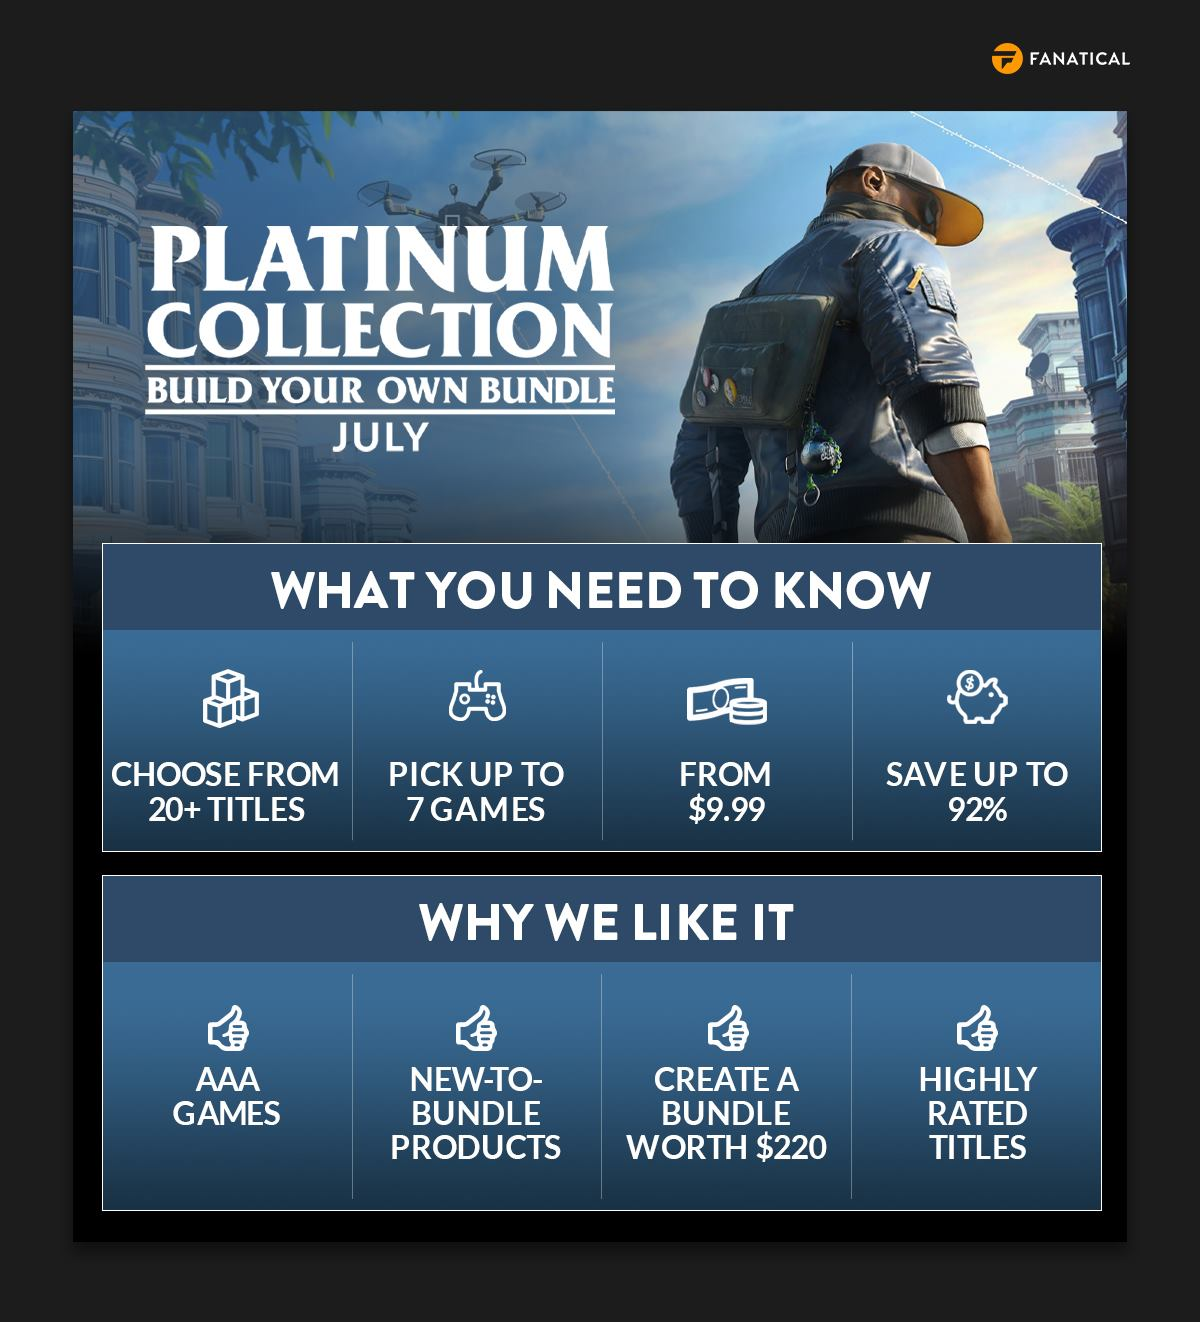 Fanatical Platinum Collection – Build Your Own Bundle July 2021